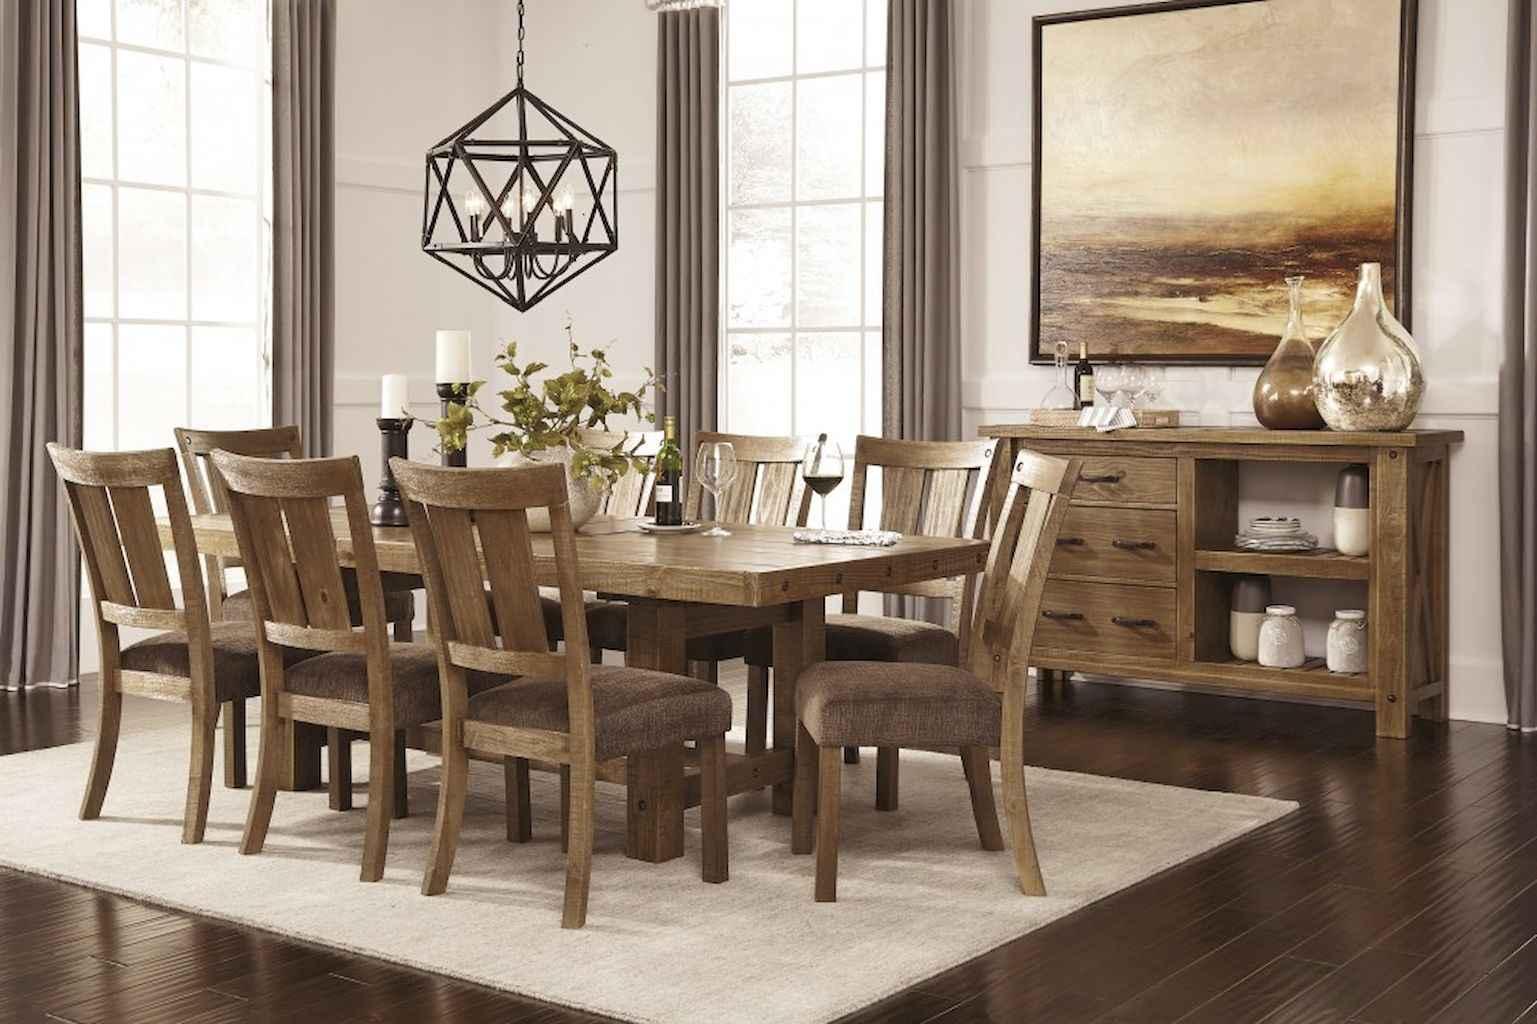 100 Rustic Farmhouse Dining Room Decor Ideas (34)